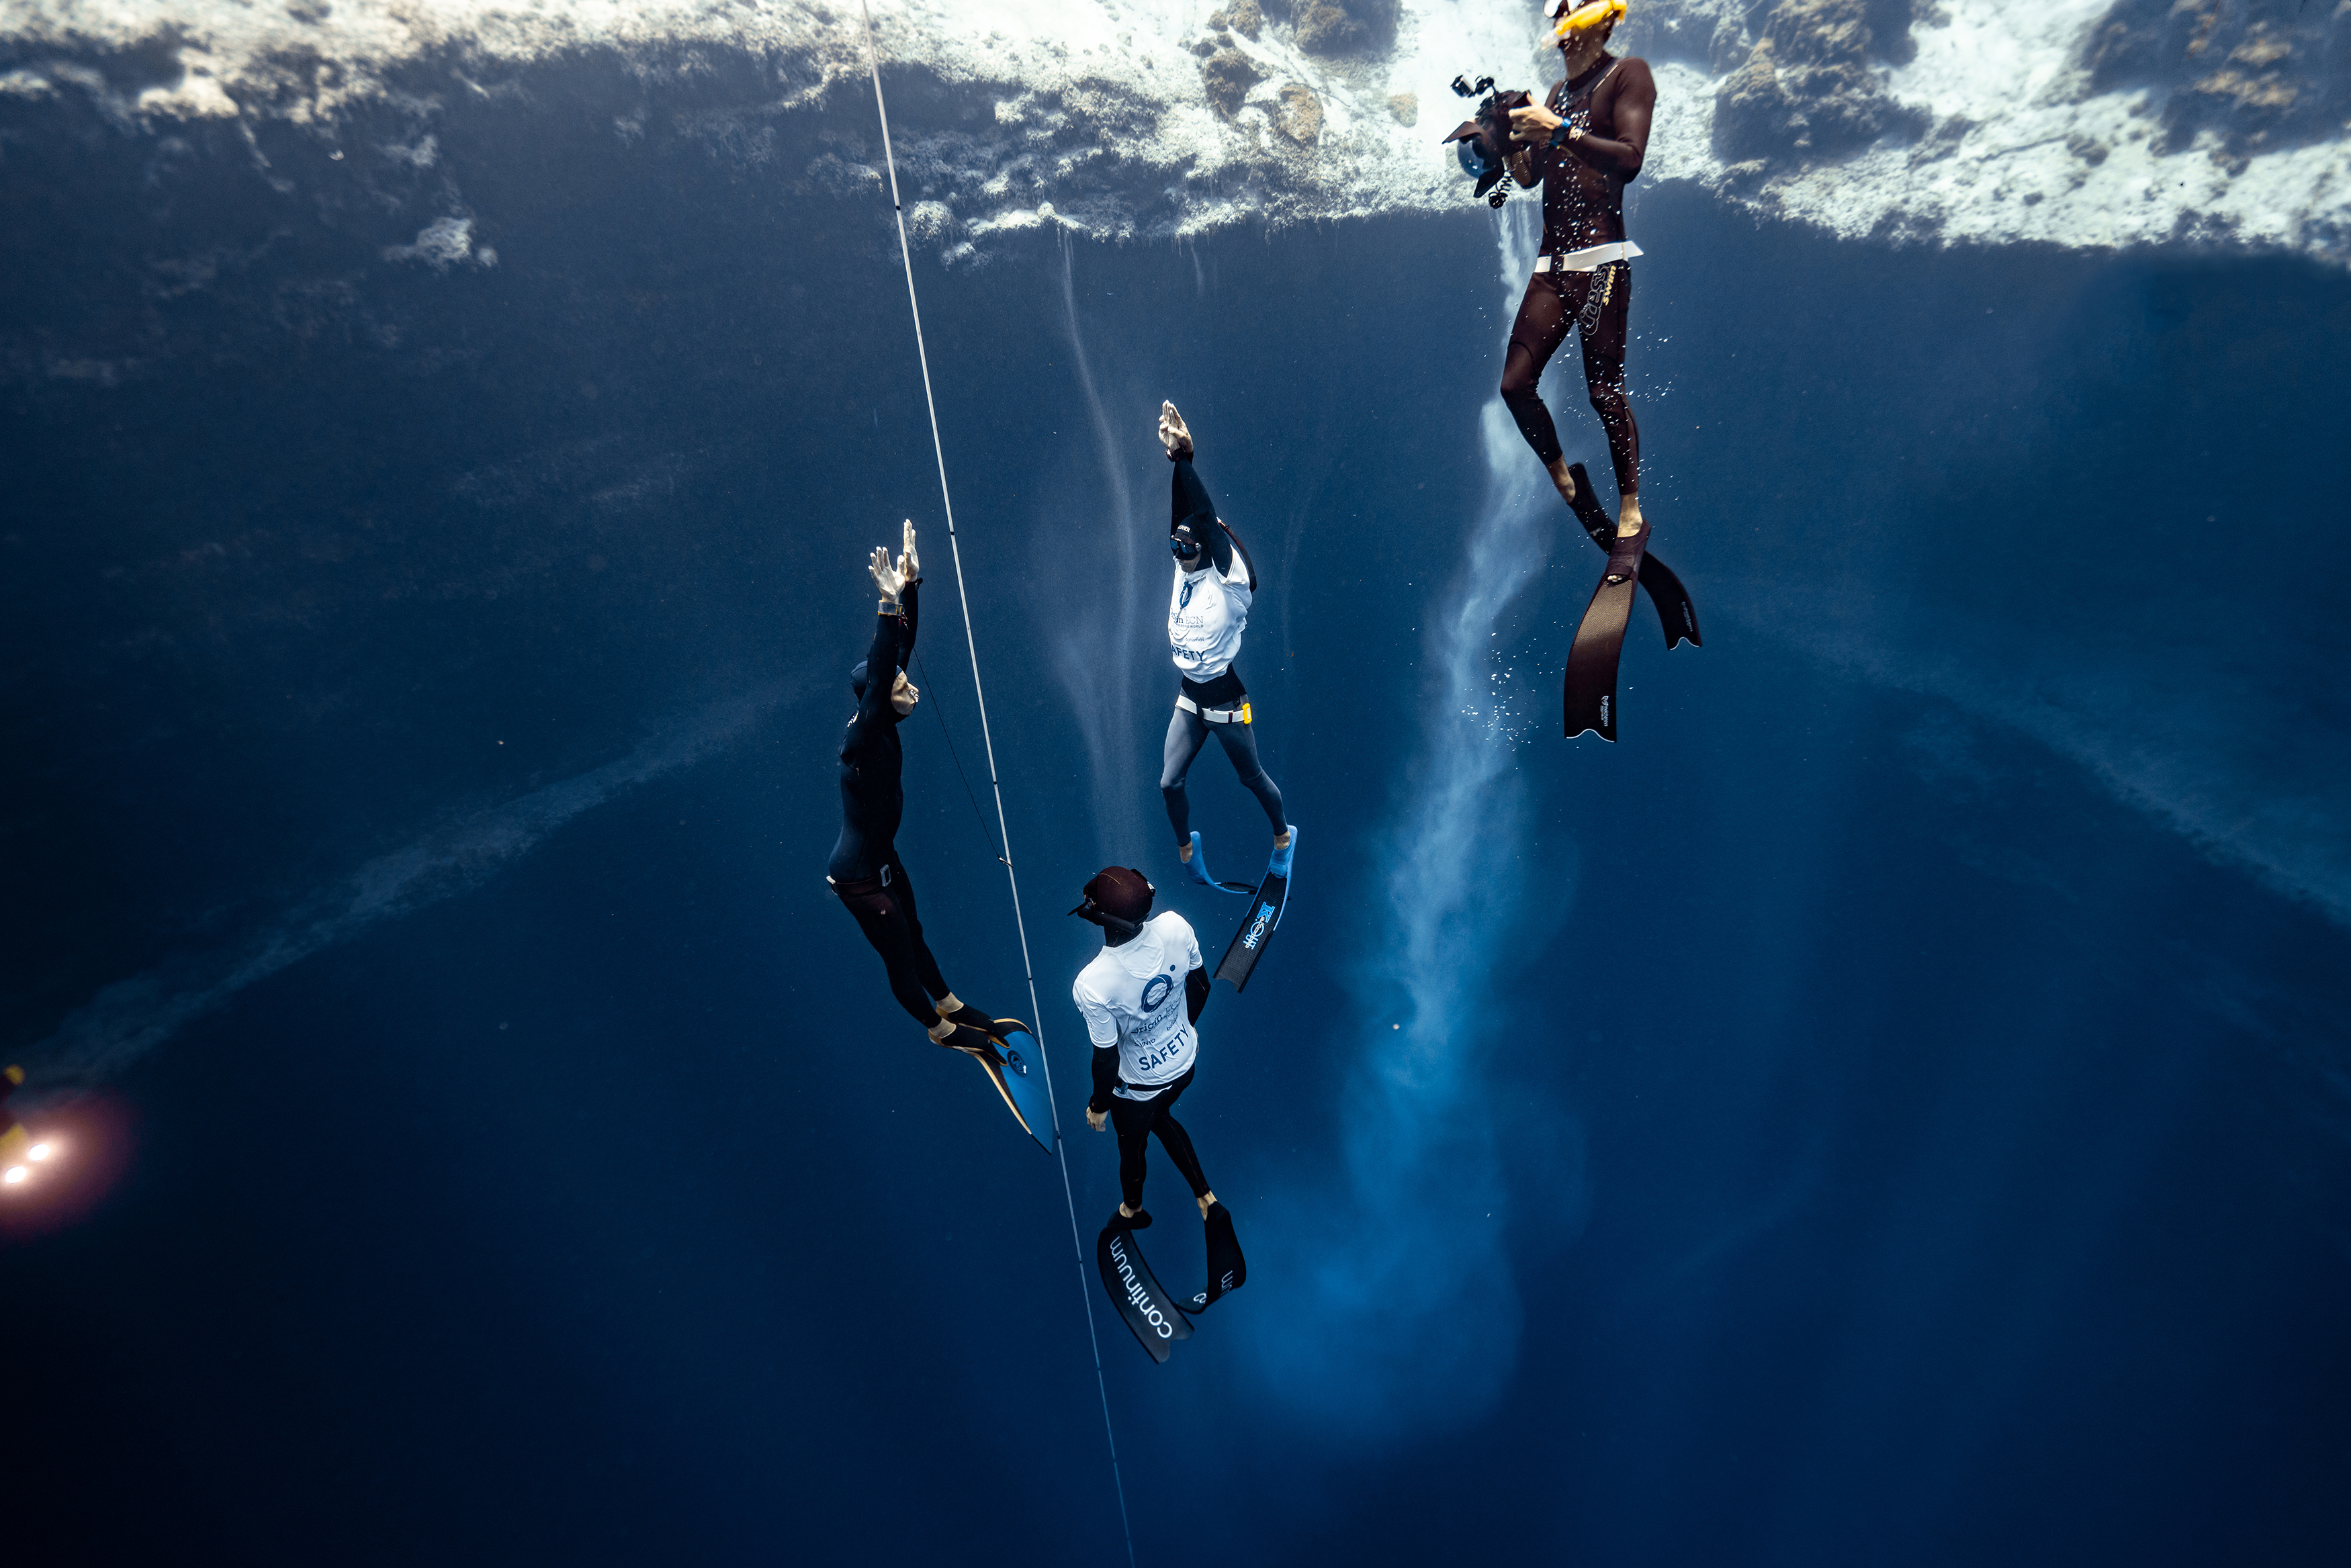 Daniel Koval ascending 102m/335ft.